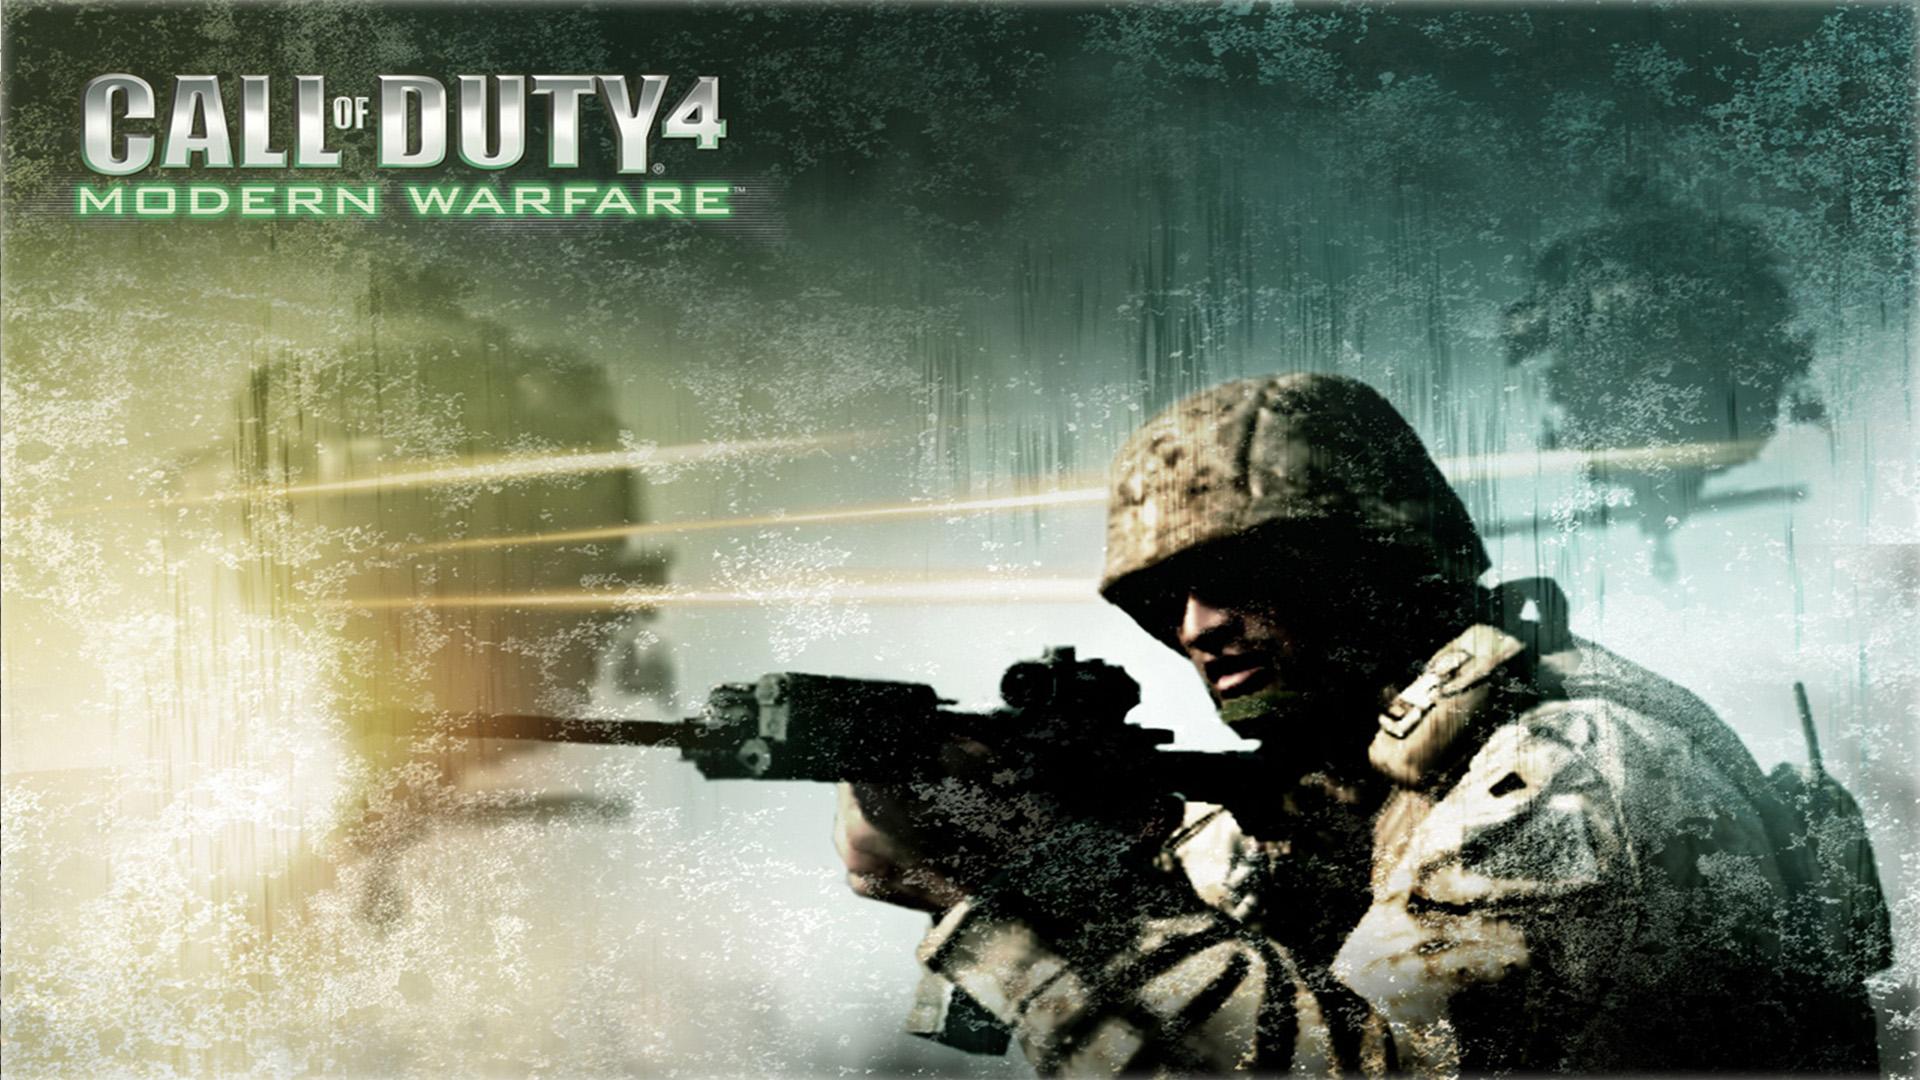 call of duty modern warfare wallpaper 1080p